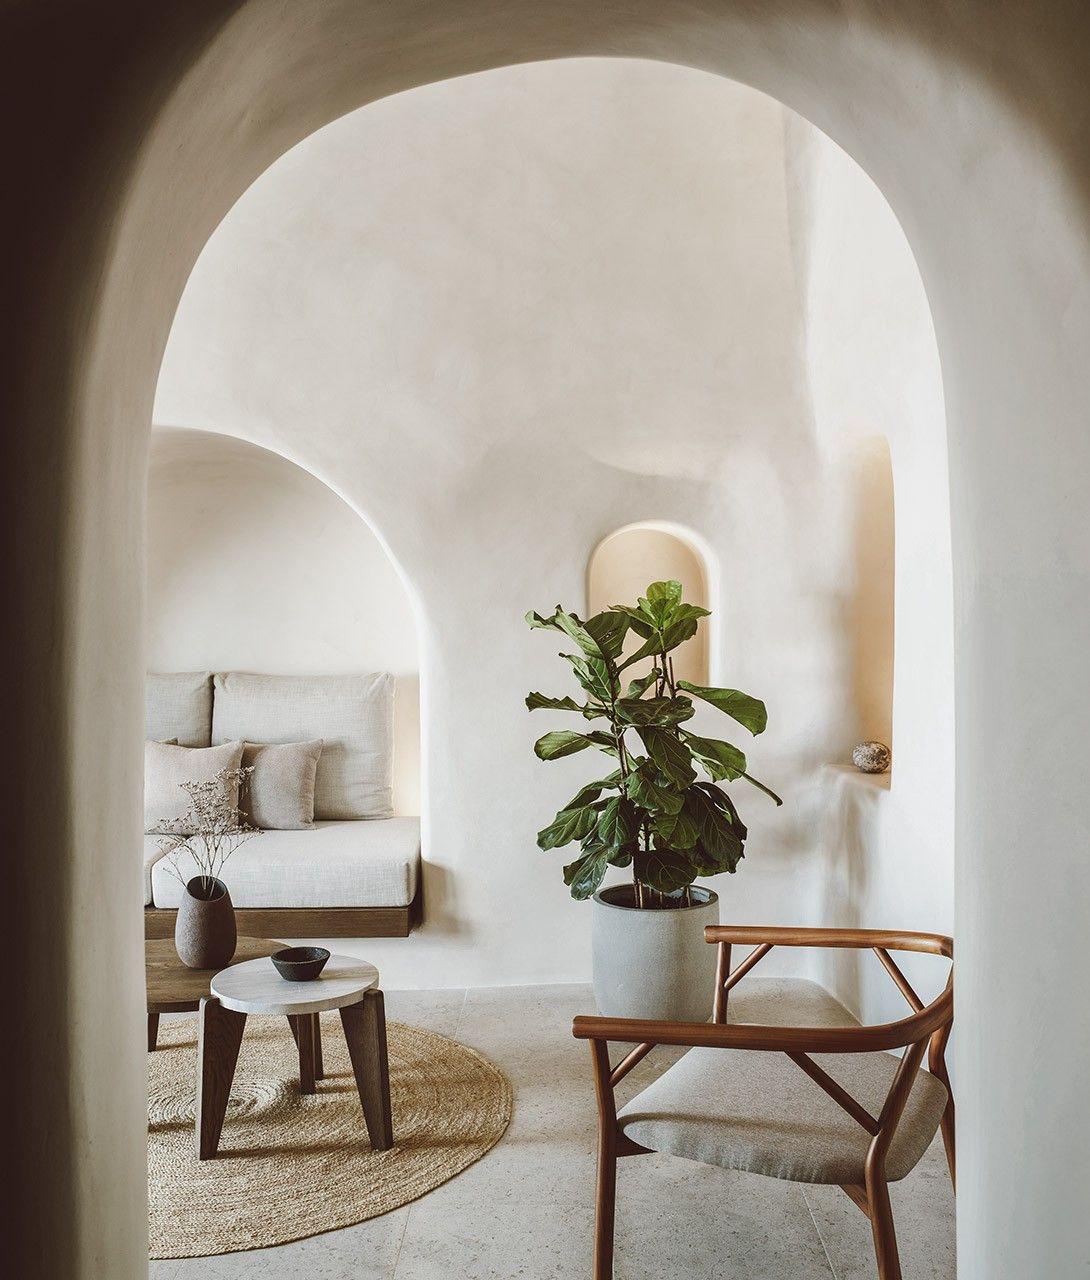 Furniture Interior Design Vora Santorini In Santorini Greece Modern Houses Interior Hotel Room Design Santorini House